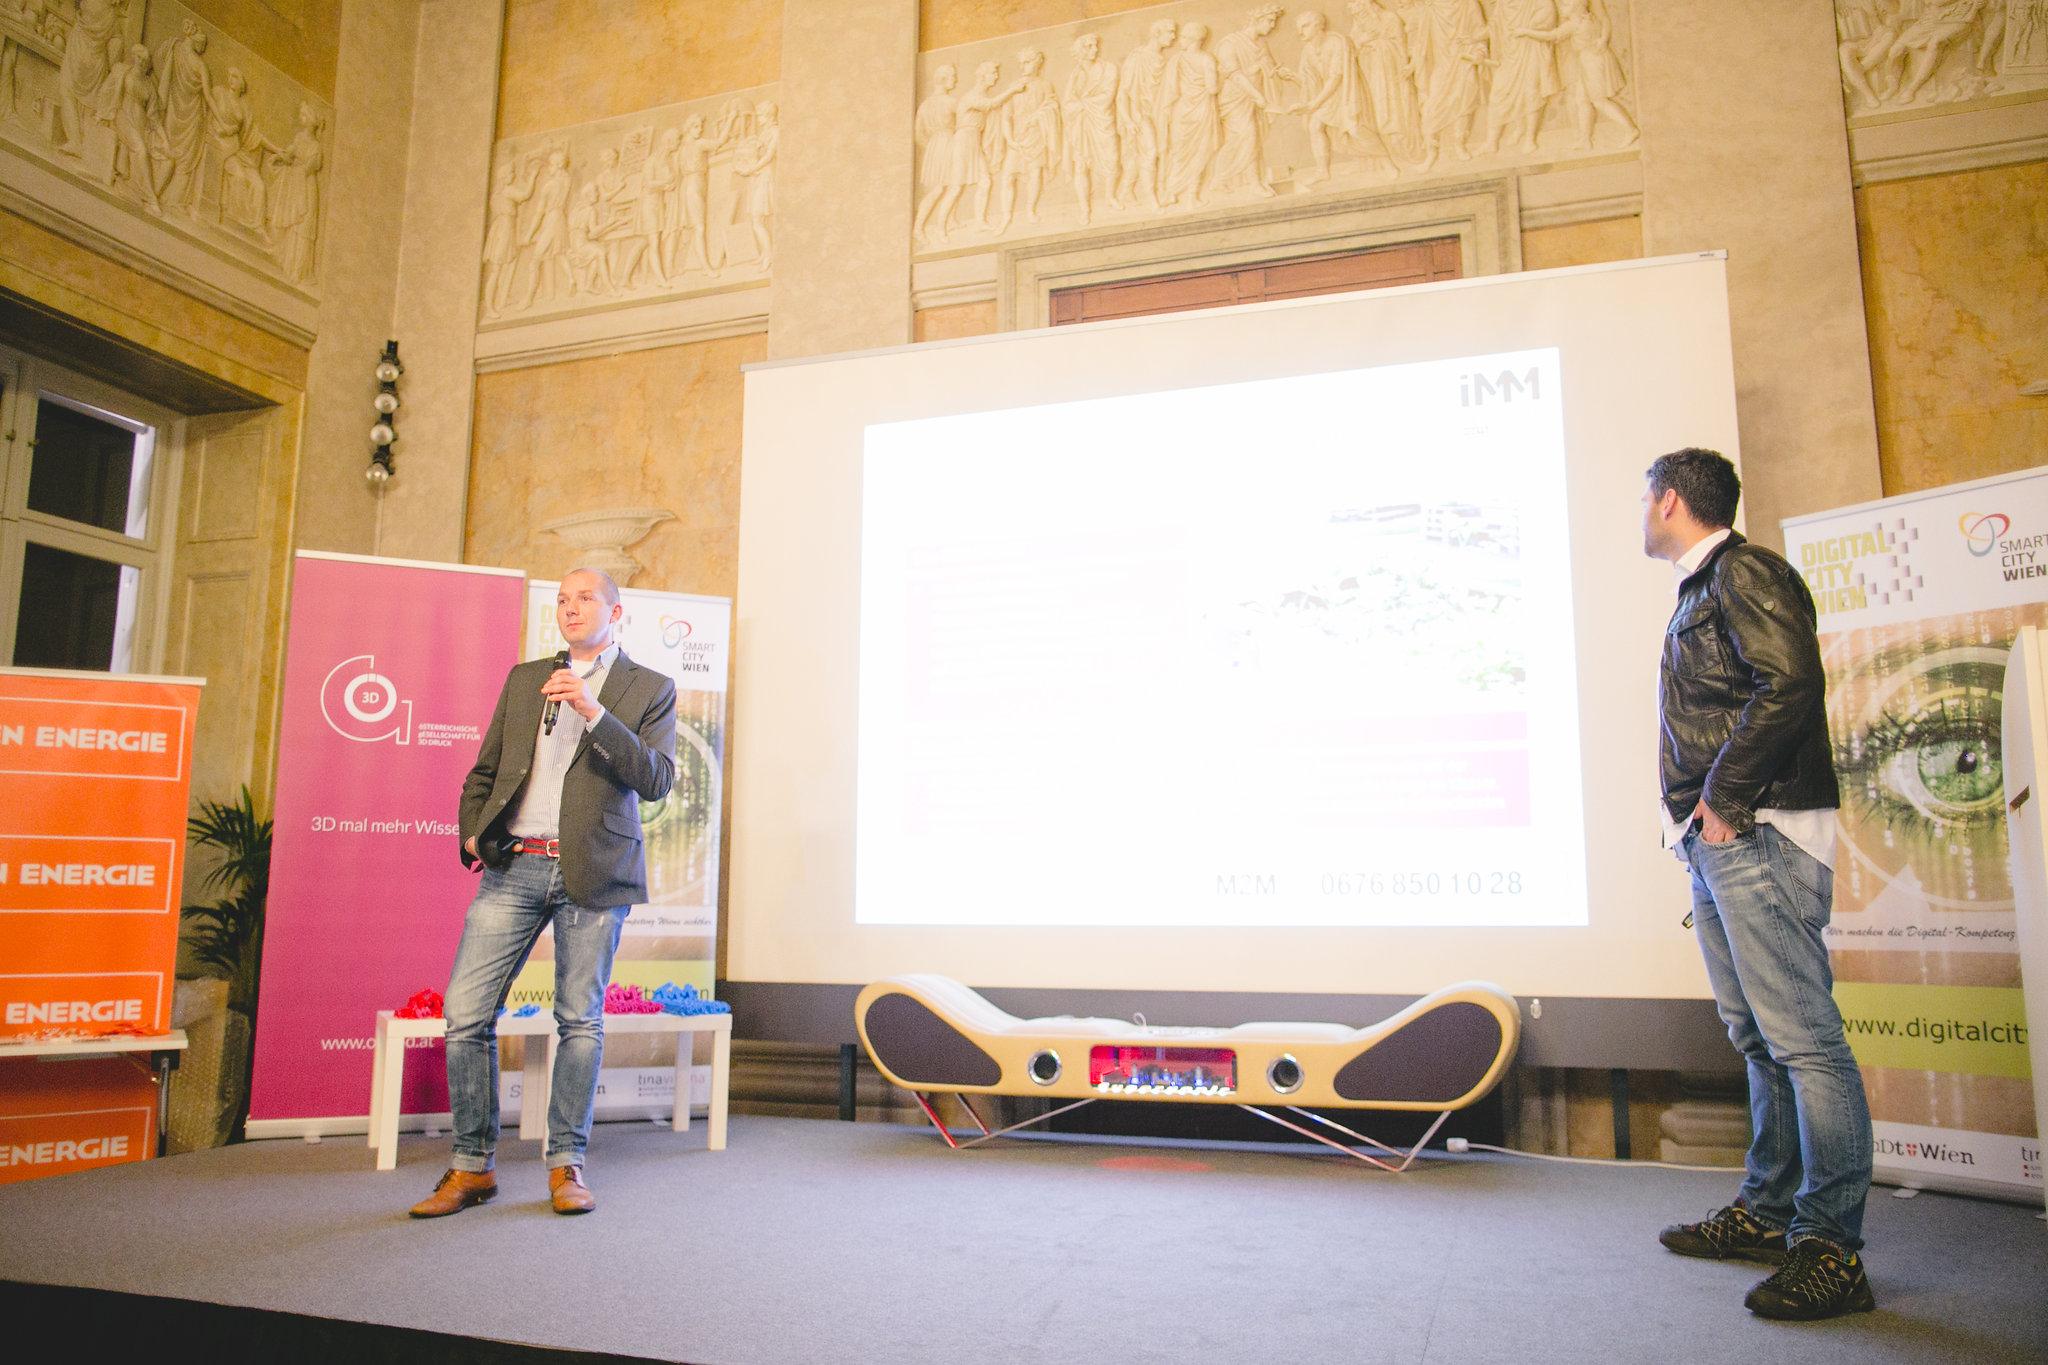 Manfred Czujan und Robert Veselka bei Best of Industry meets Makers 2016